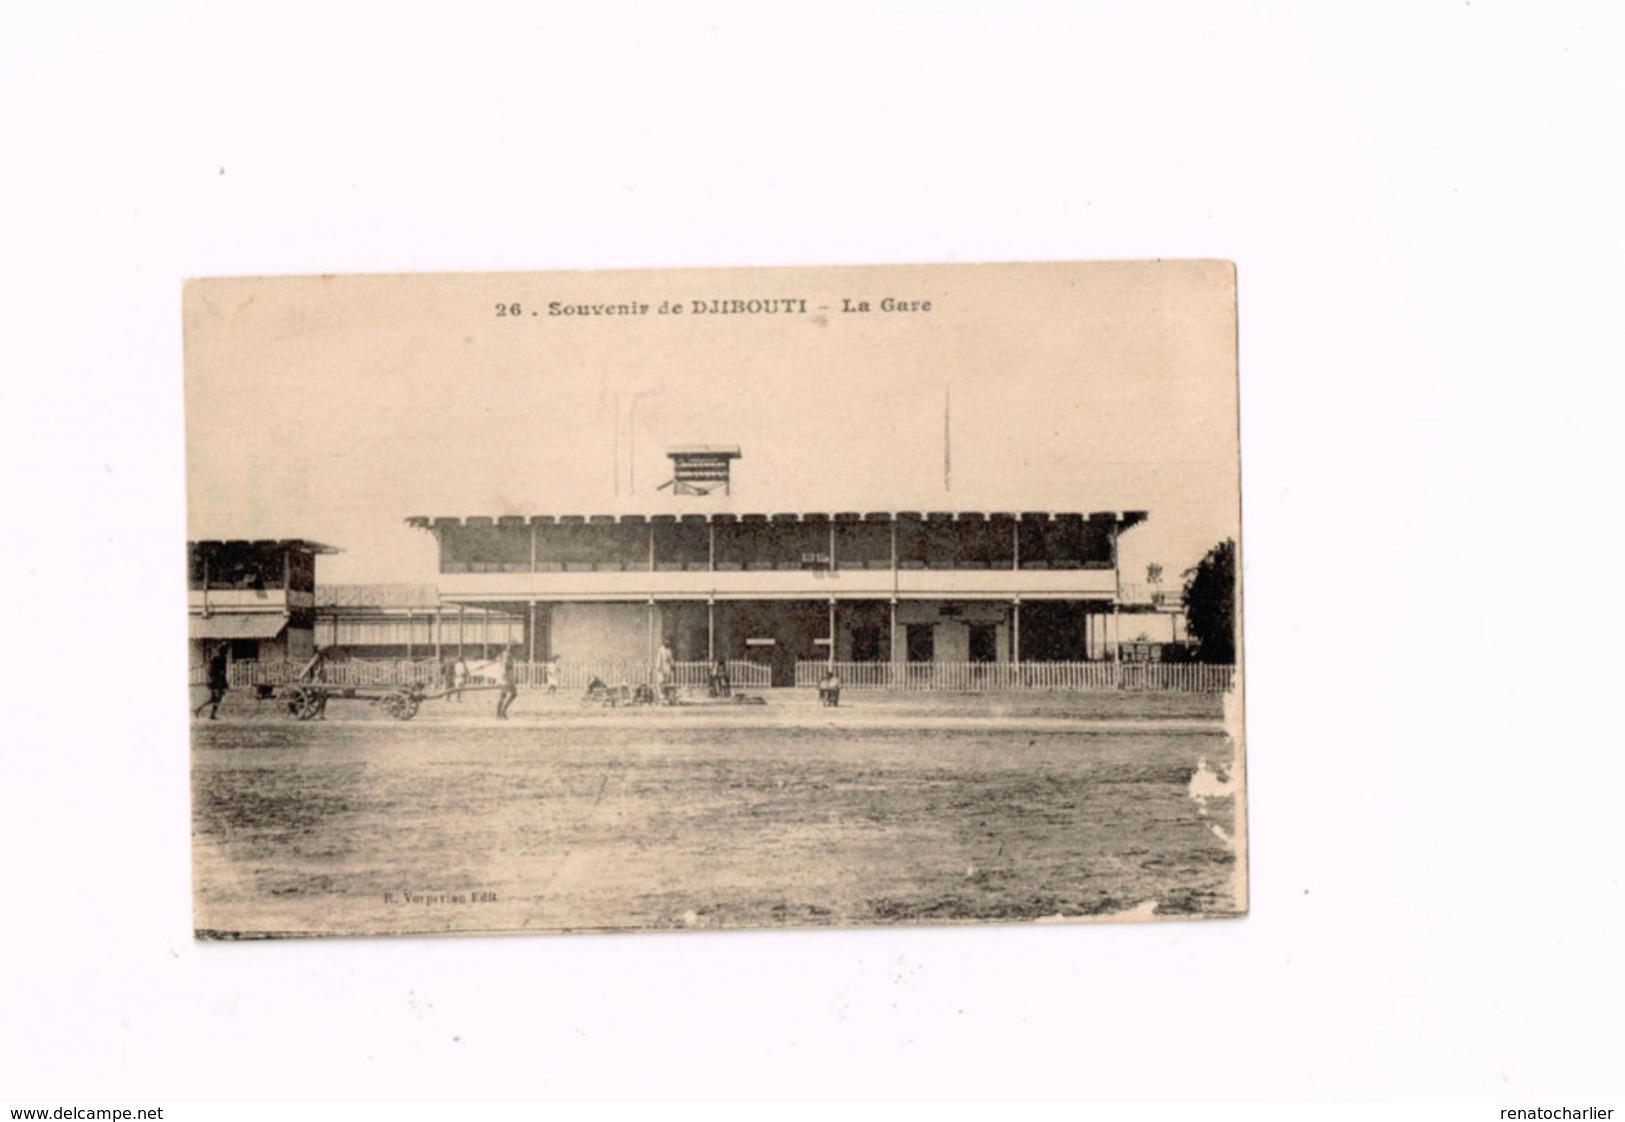 Souvenir De Djibouti.La Gare. - Djibouti